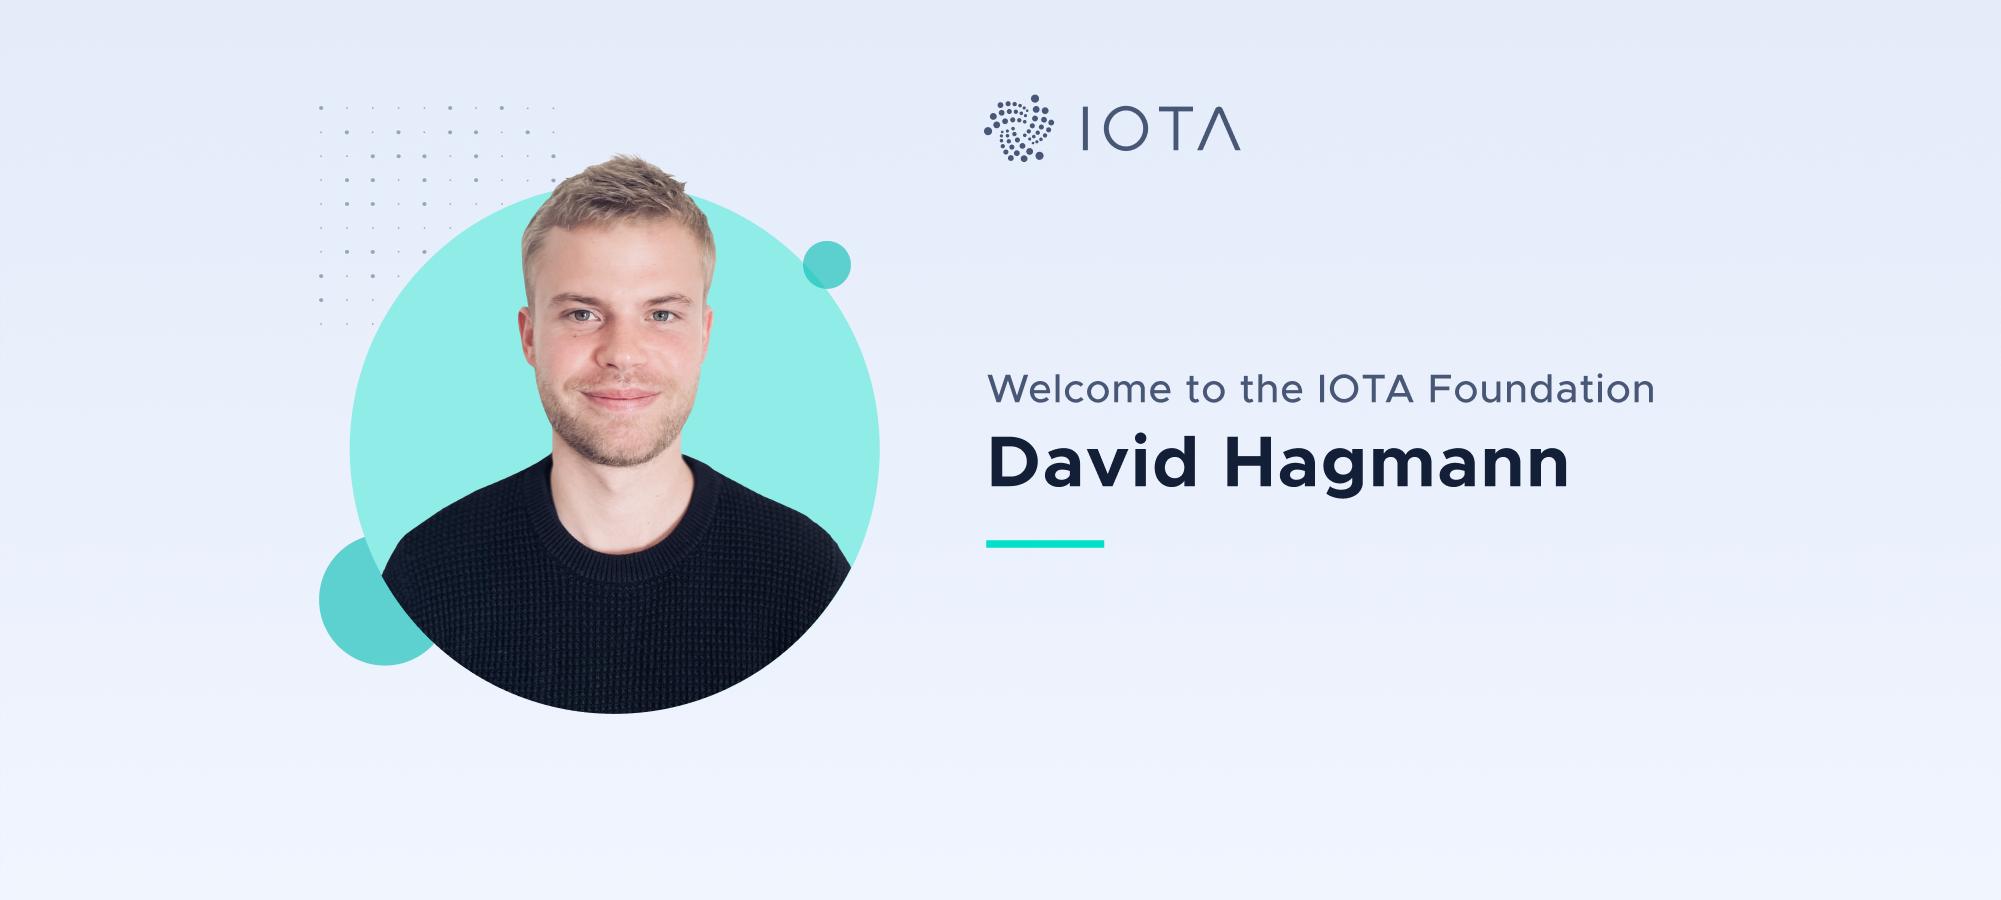 Welcome David Hagmann to the IOTA Foundation